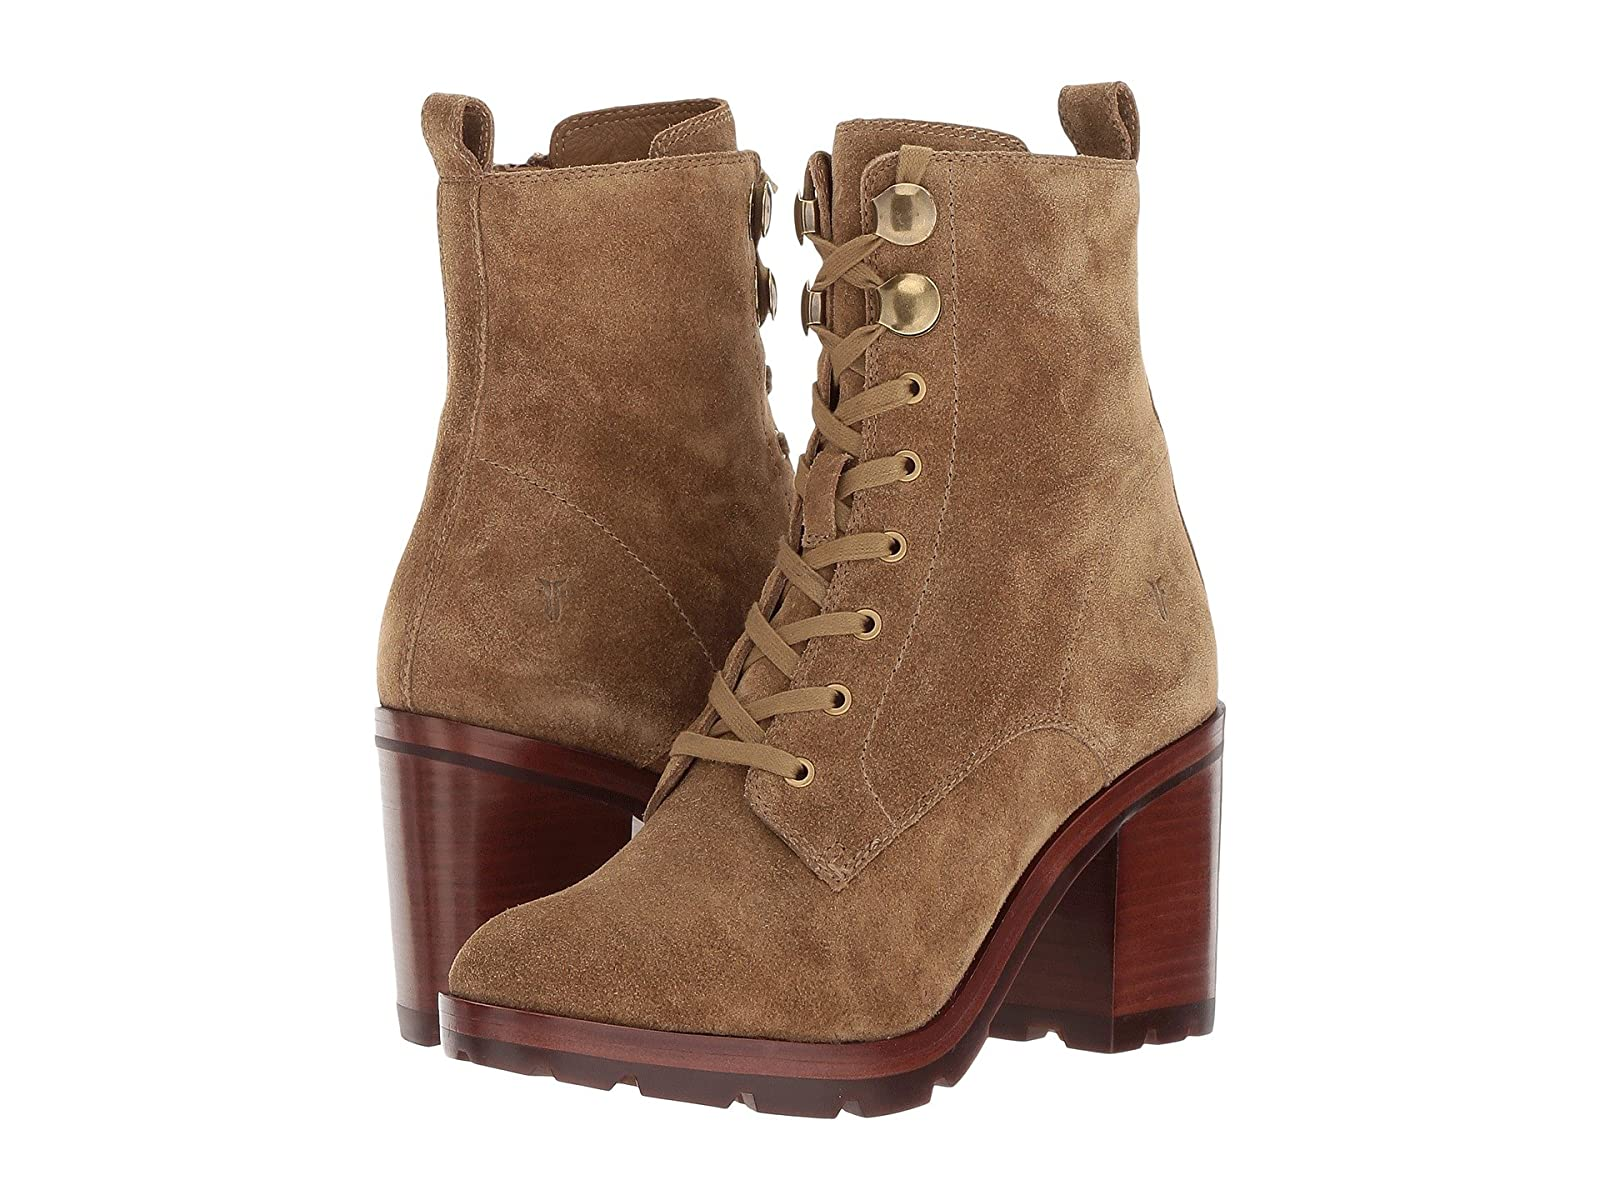 Frye Myra Lug CombatCheap and distinctive eye-catching shoes